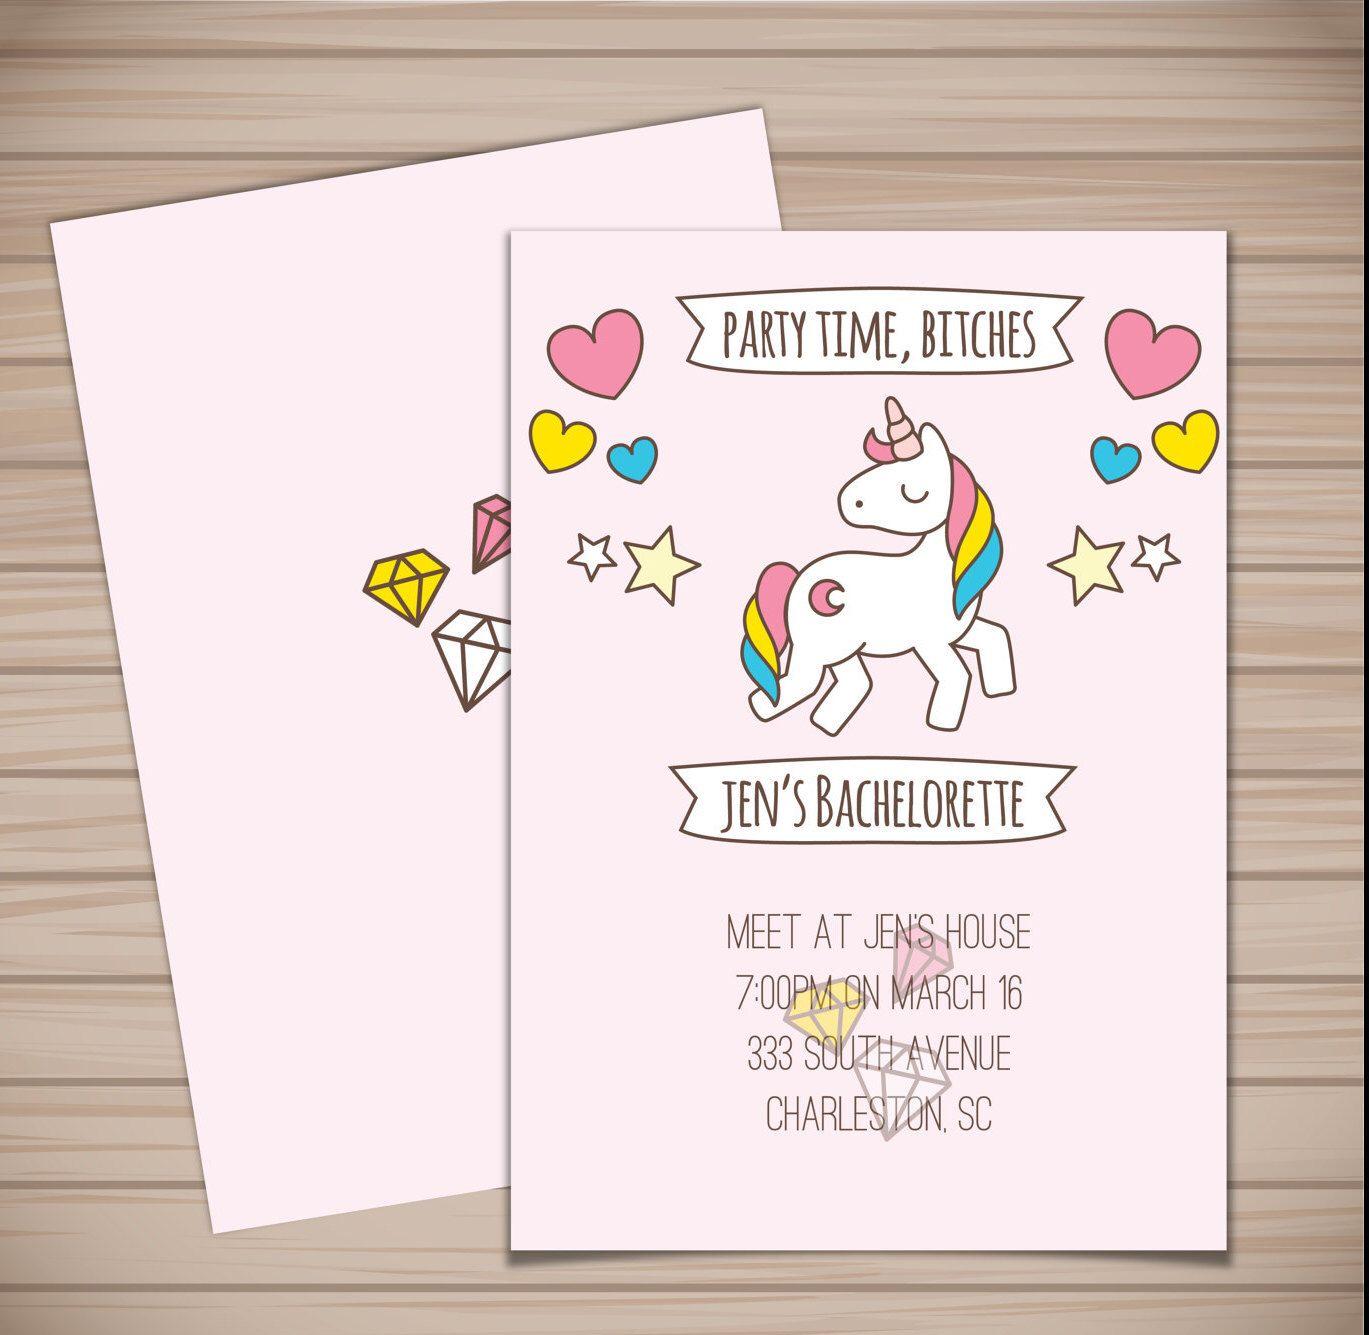 Printable Unicorn Bachelorette Party Invitation Party Time Bitches